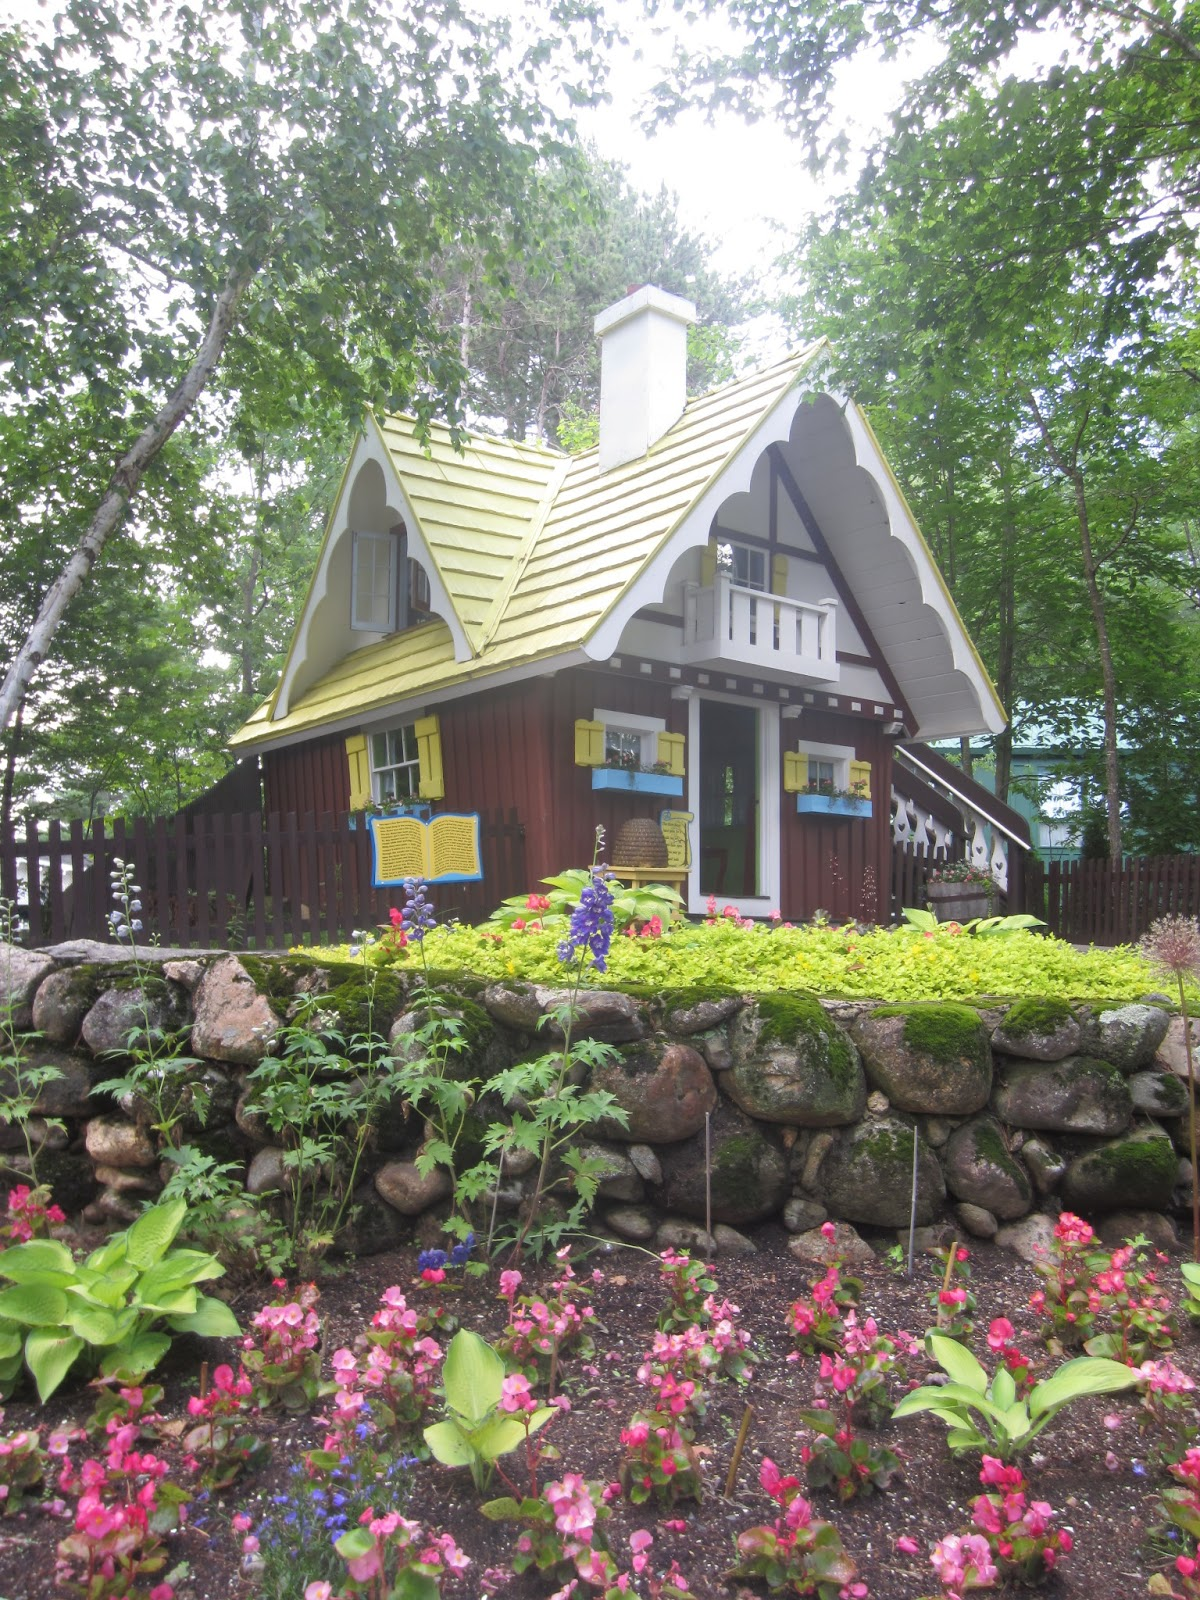 Relaxshackscom The Three Little Bears Tiny House Re Creation in NH